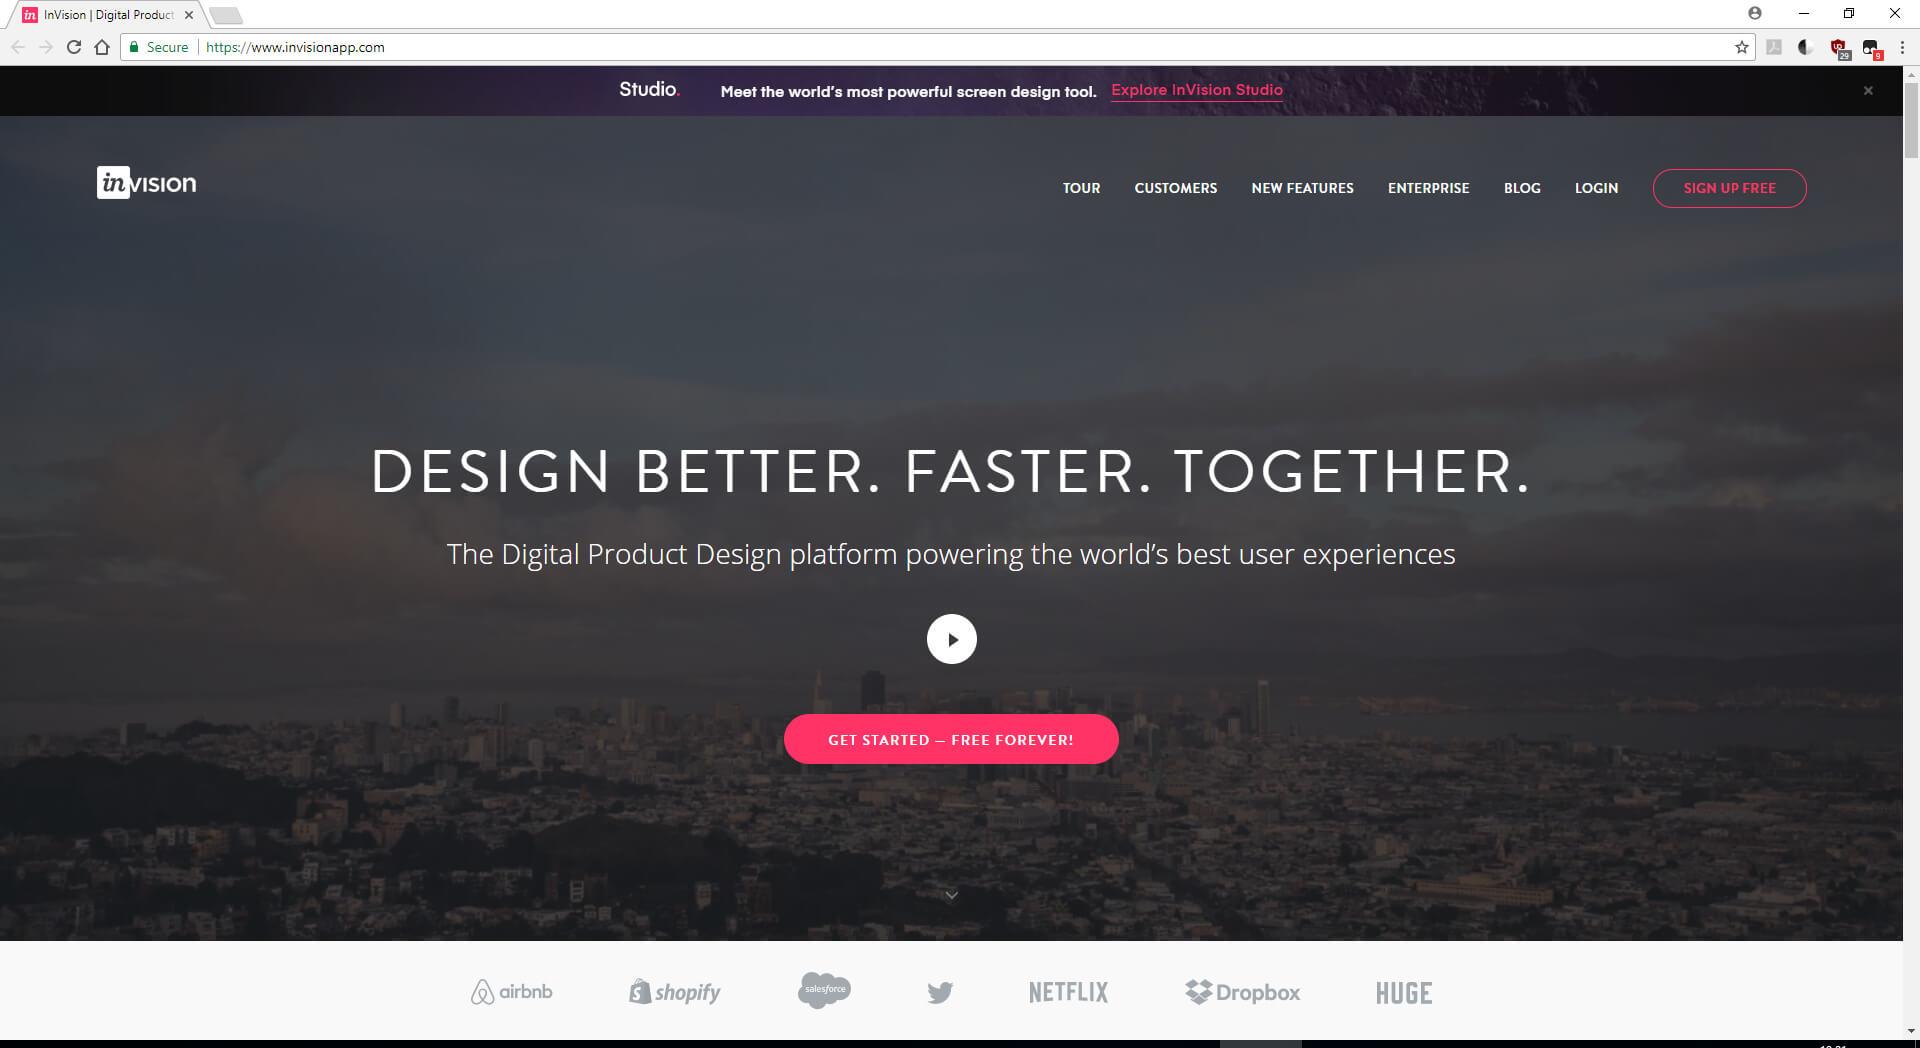 invisionapp.com